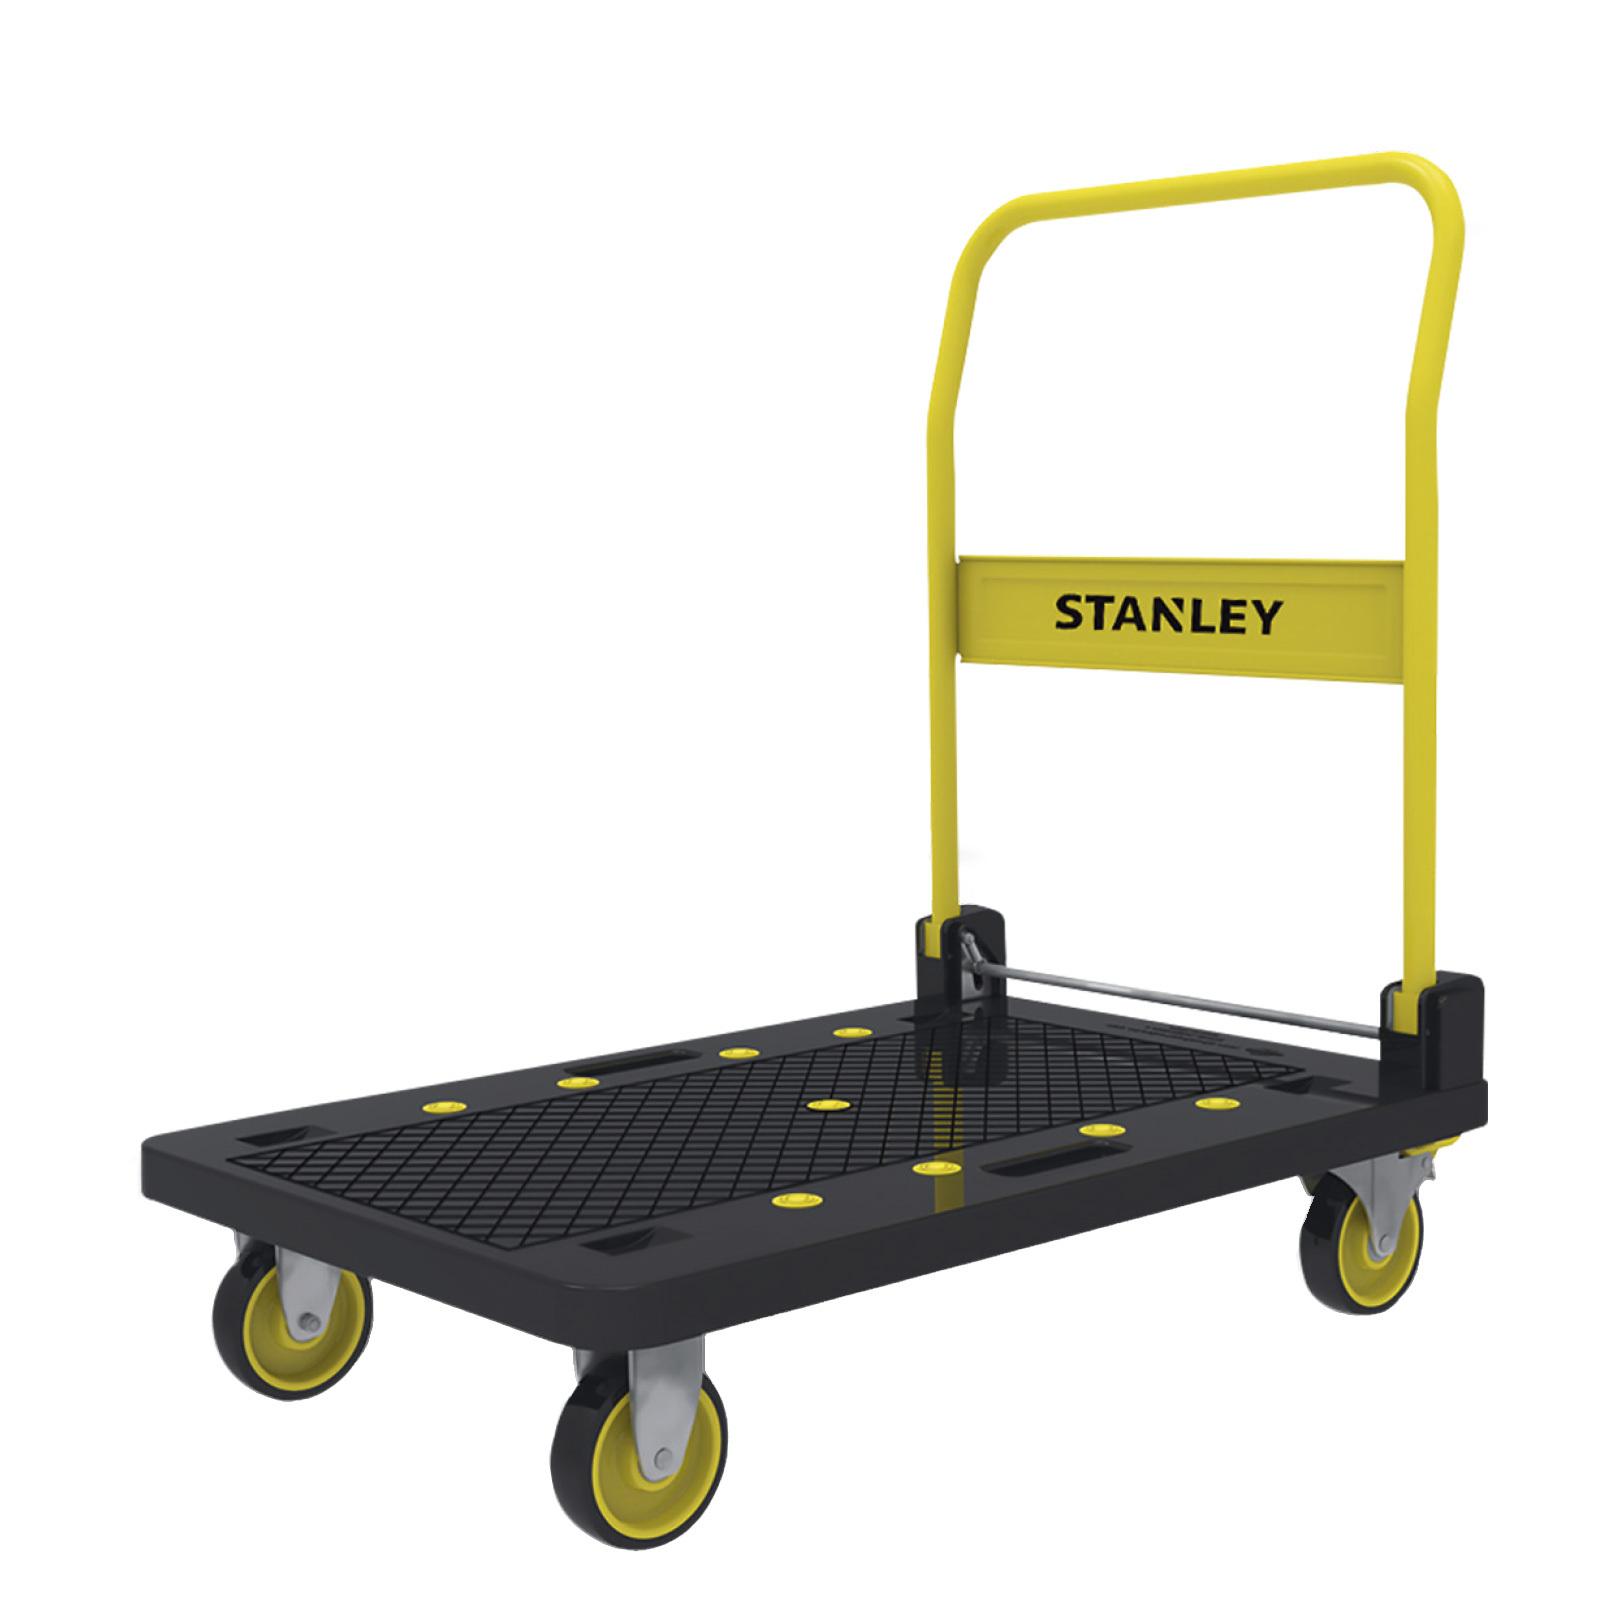 Stanley 250kg Folding Platform Trolley